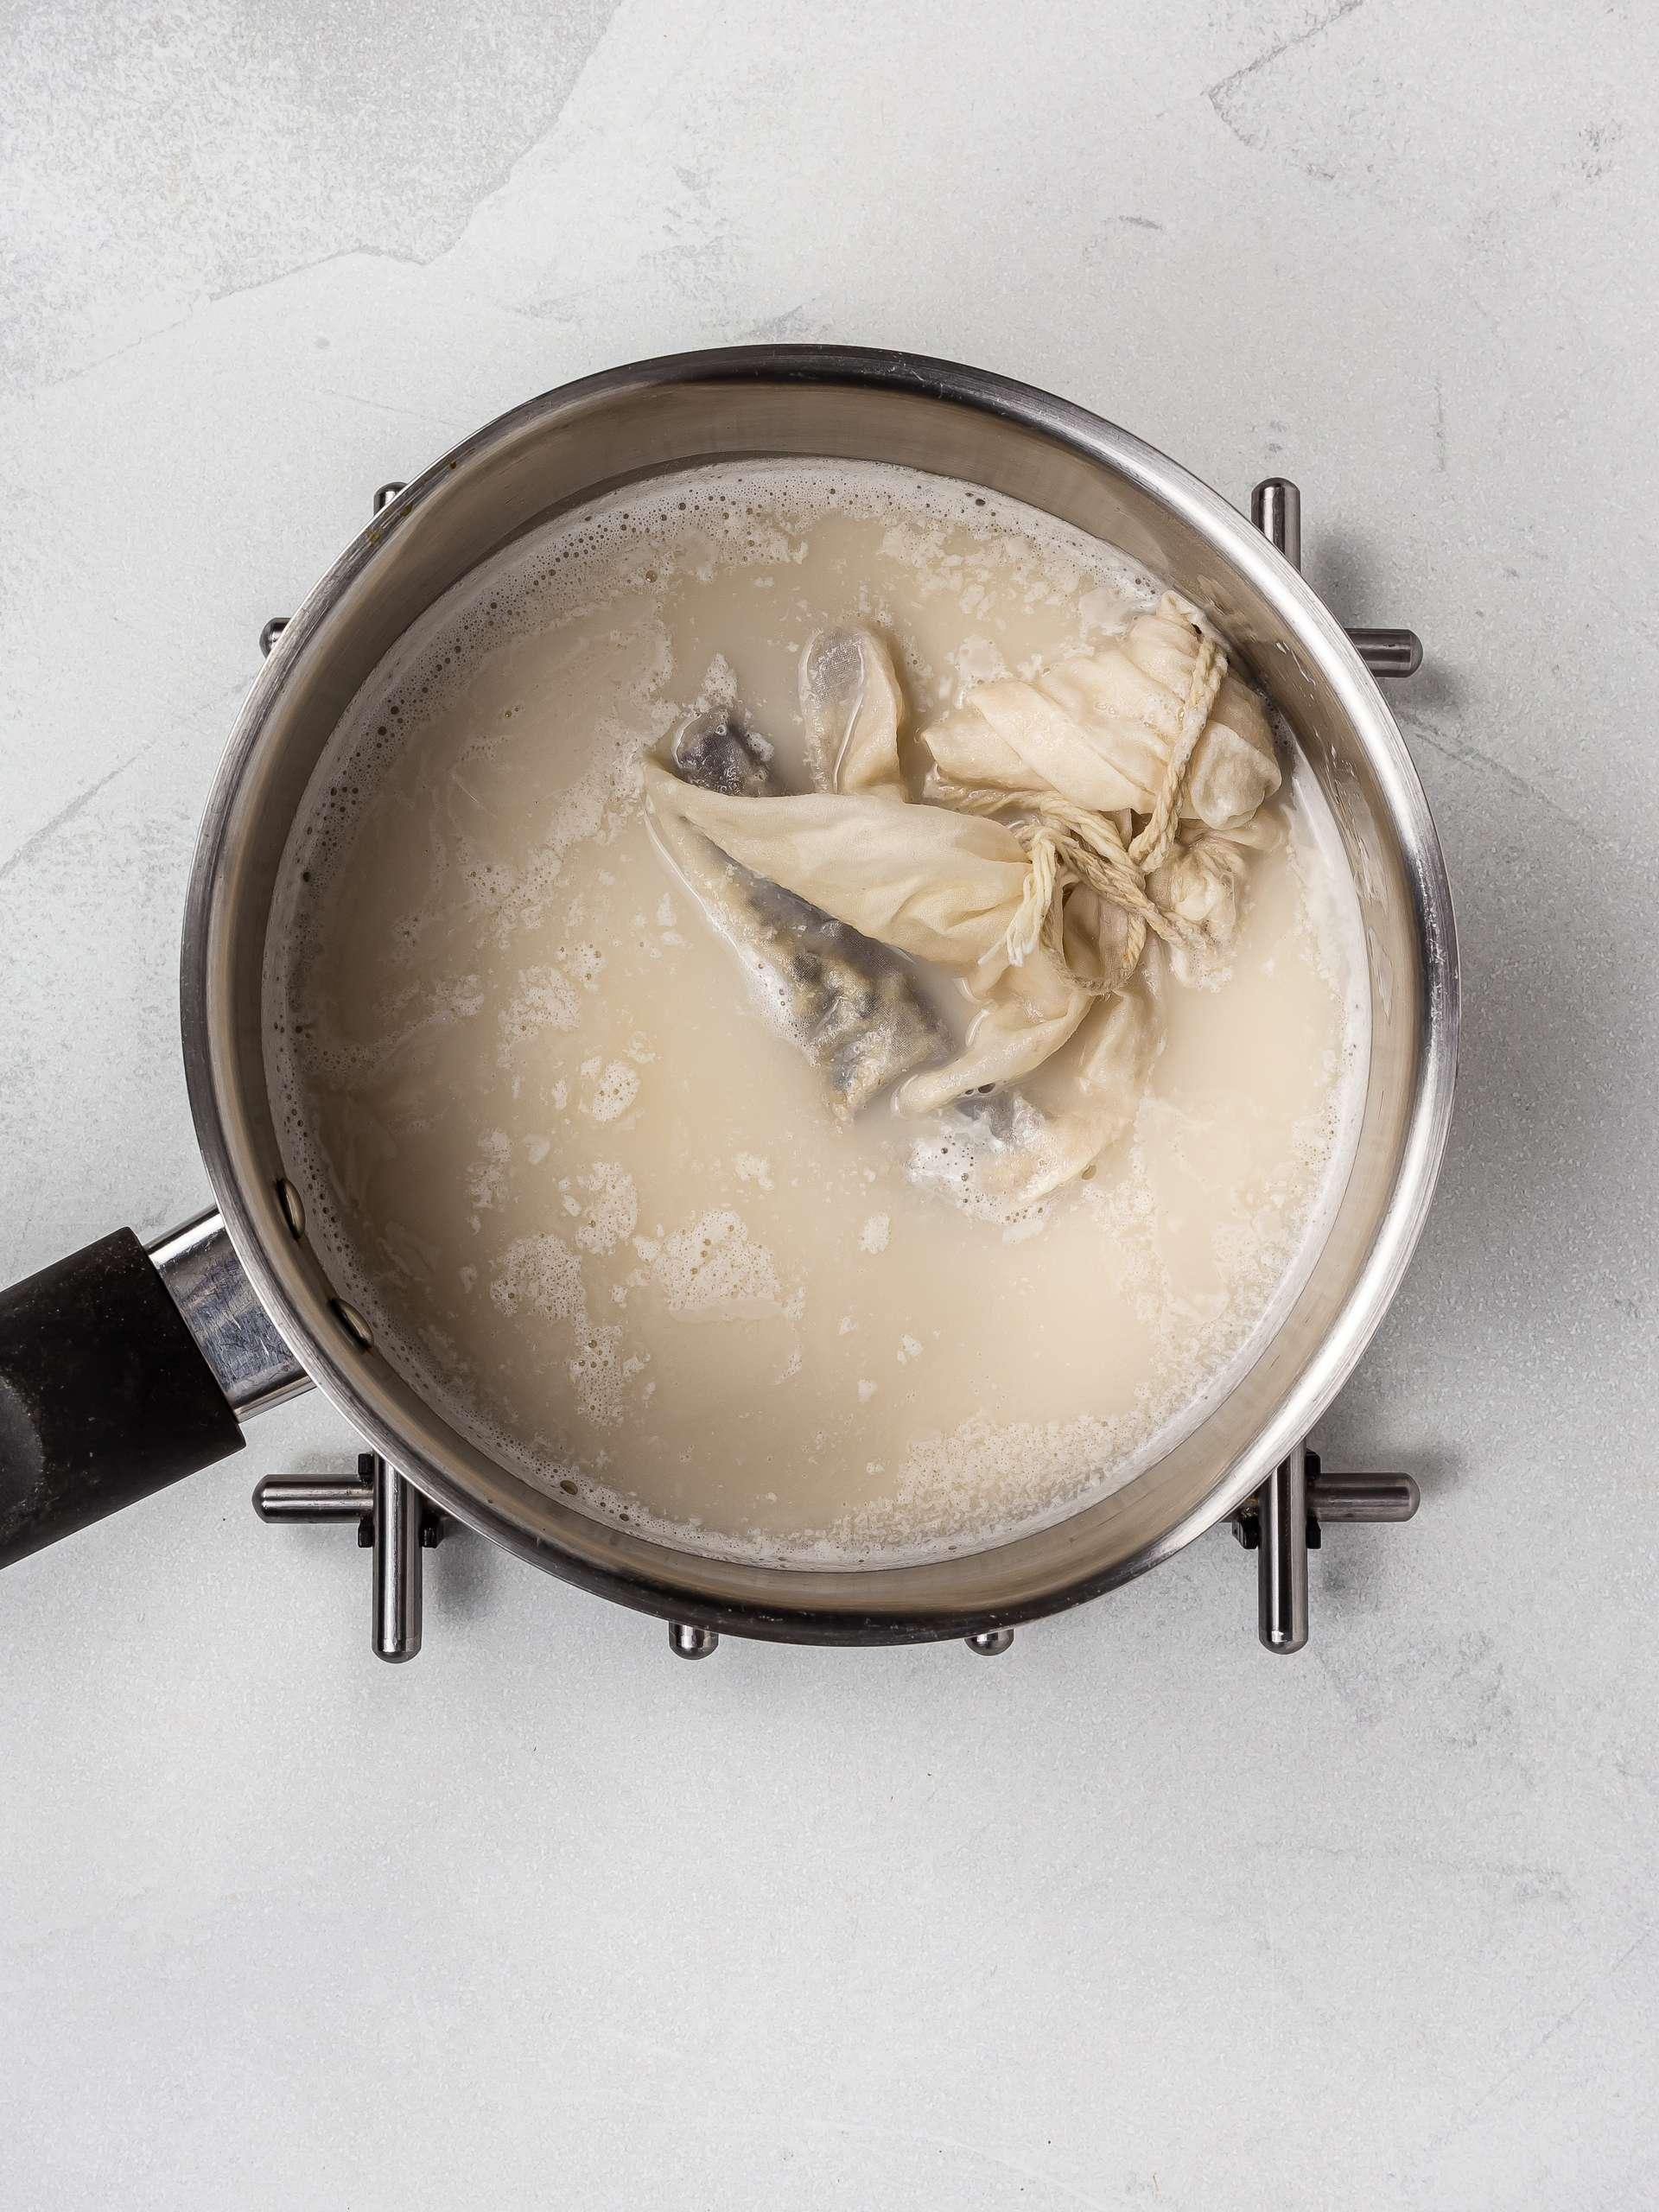 coconut milk with chai spice mix